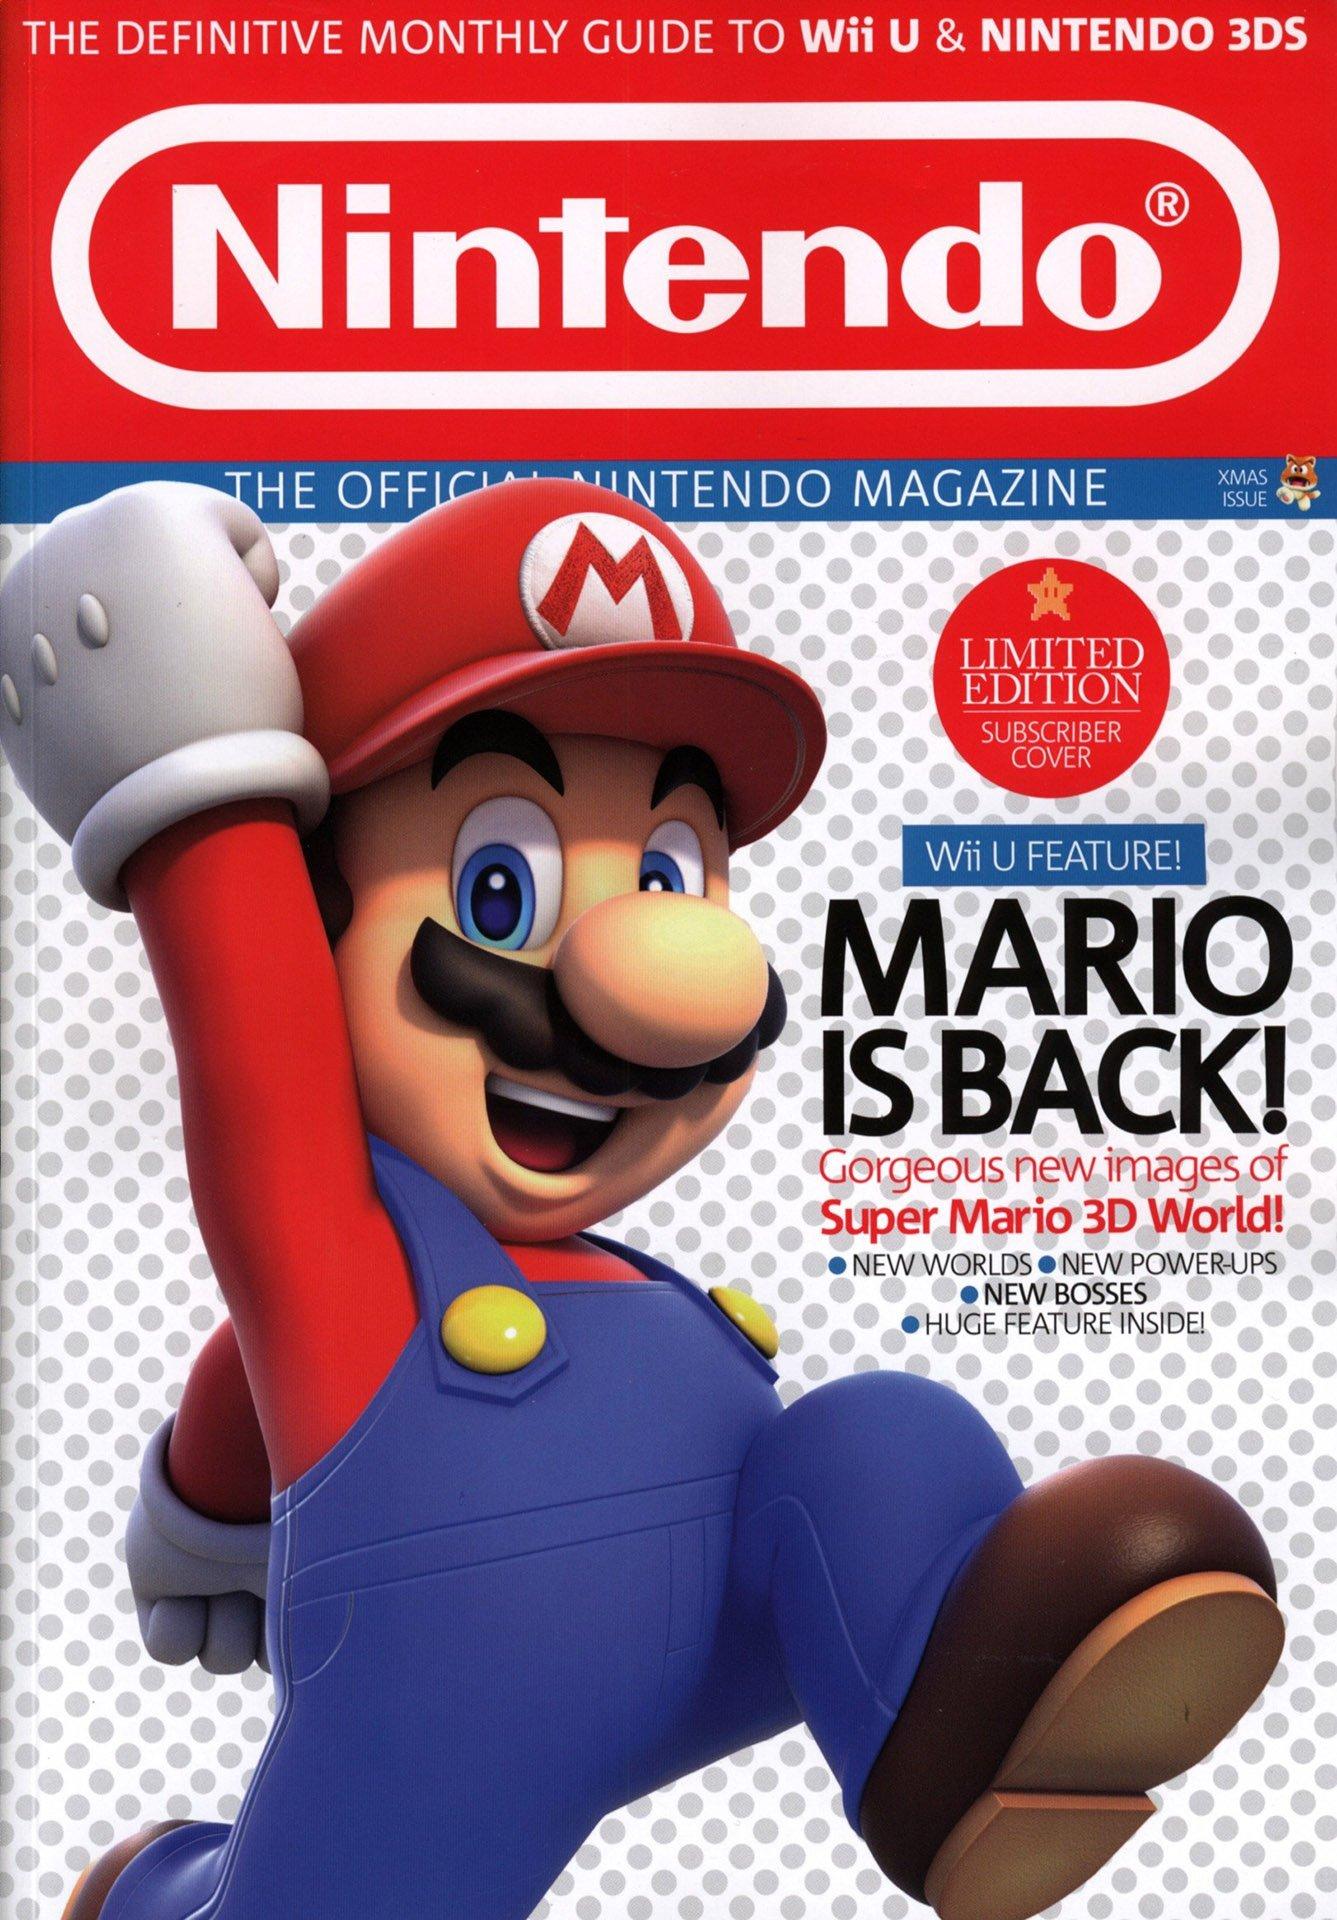 Official Nintendo Magazine 101 (Christmas 2013) (subscriber cover)